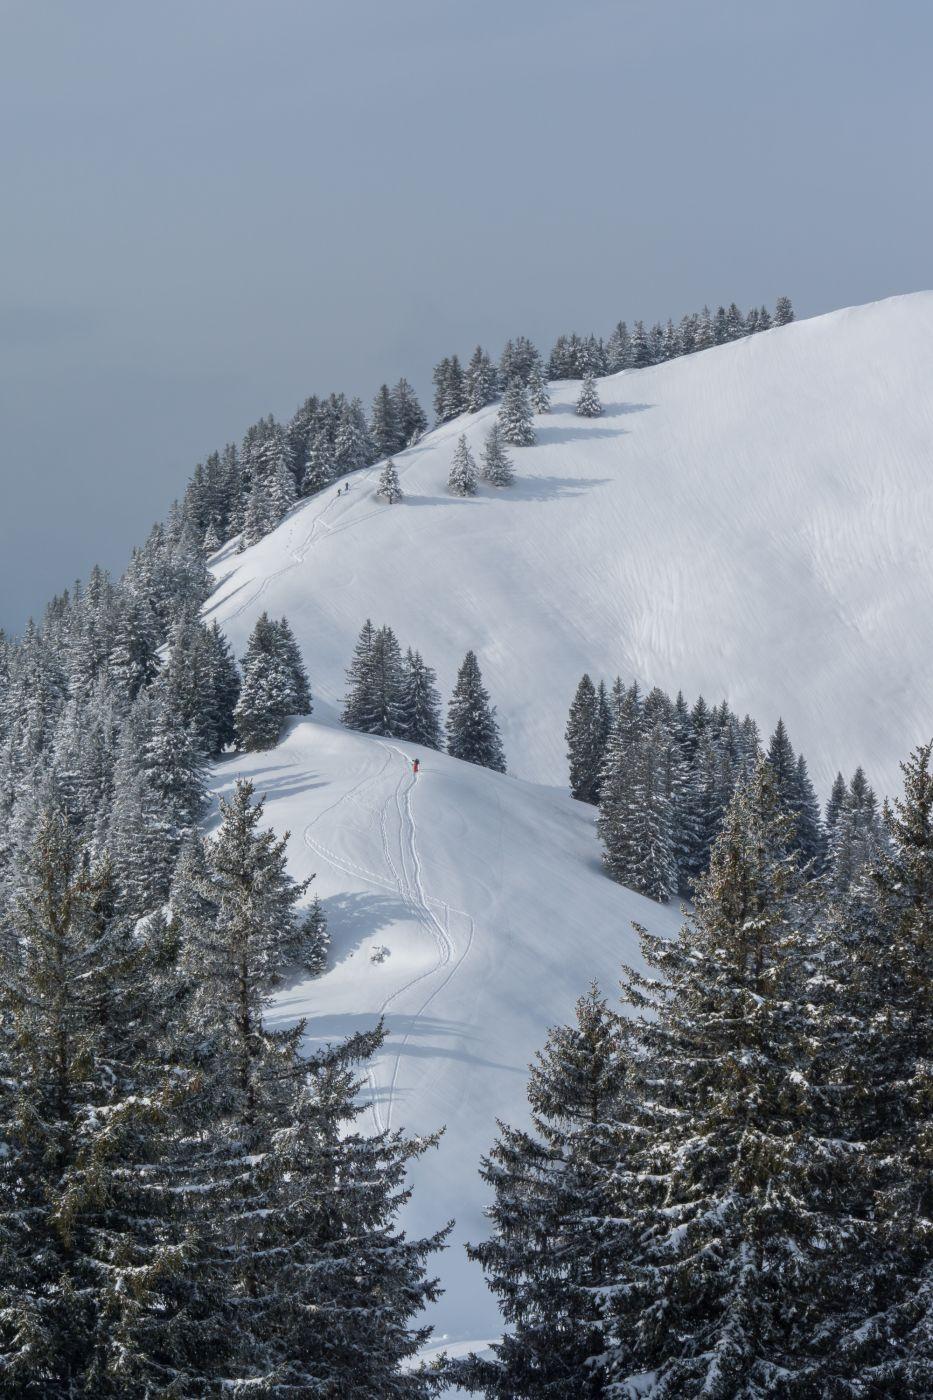 Snow shoe hikers, Rigi, Switzerland